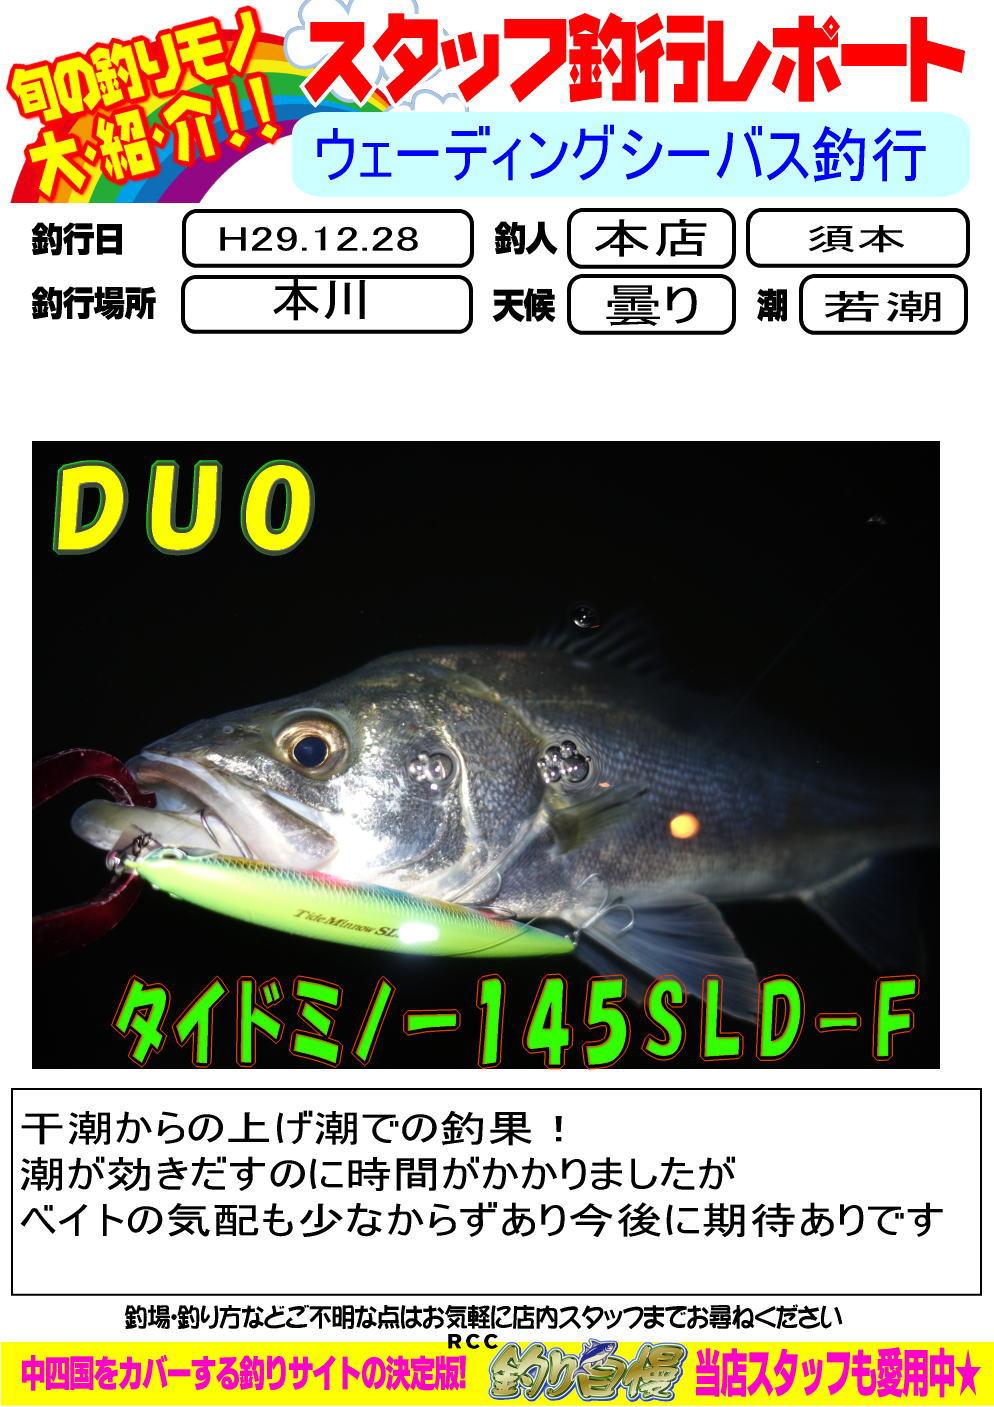 http://www.e-angle.co.jp/shop/blog/H29.12.30.jpg